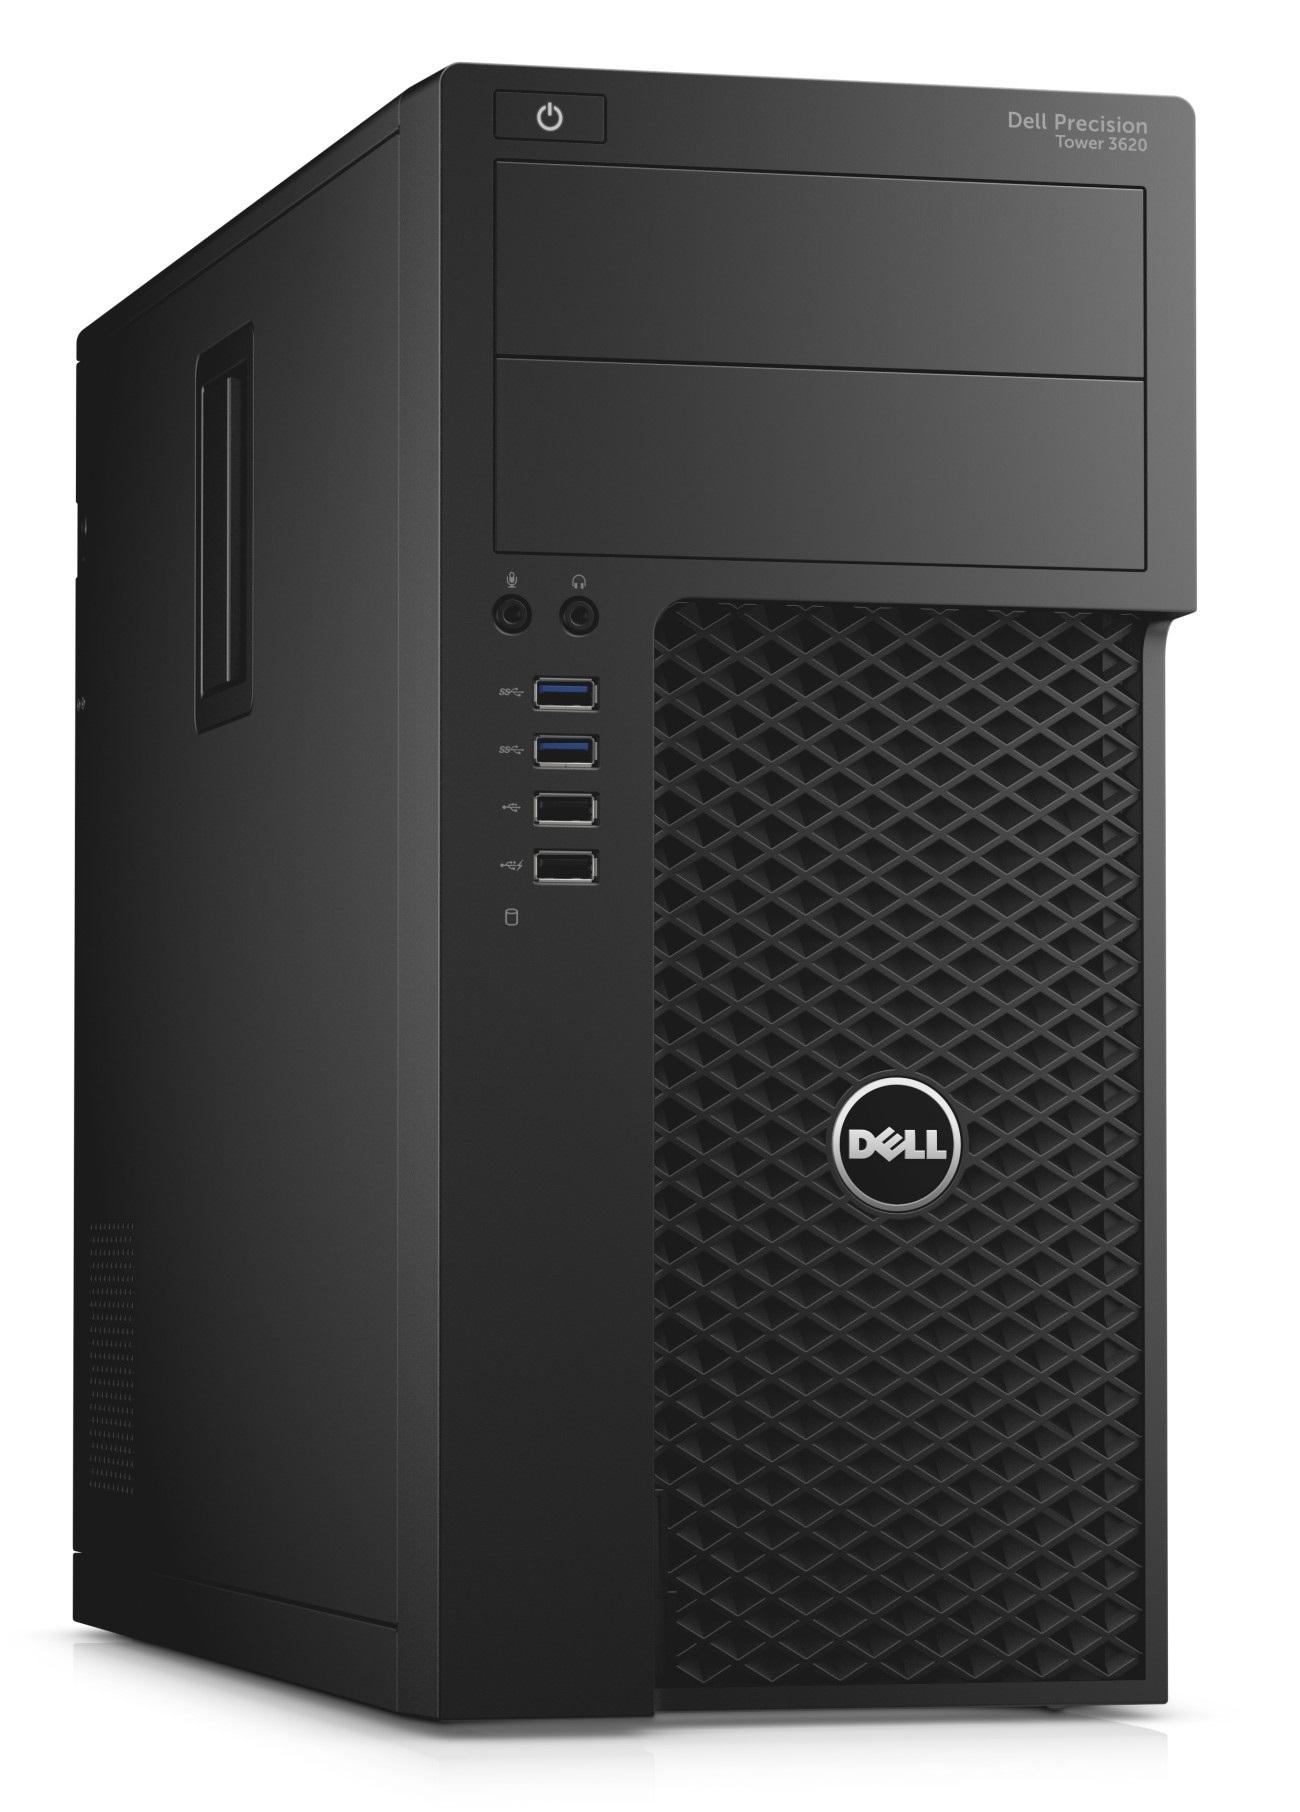 Dell Precision T3620 MT i7-6700/8G/256SSD/P400-2G/DP/MCR/W7Pro+W10P/3R NBD